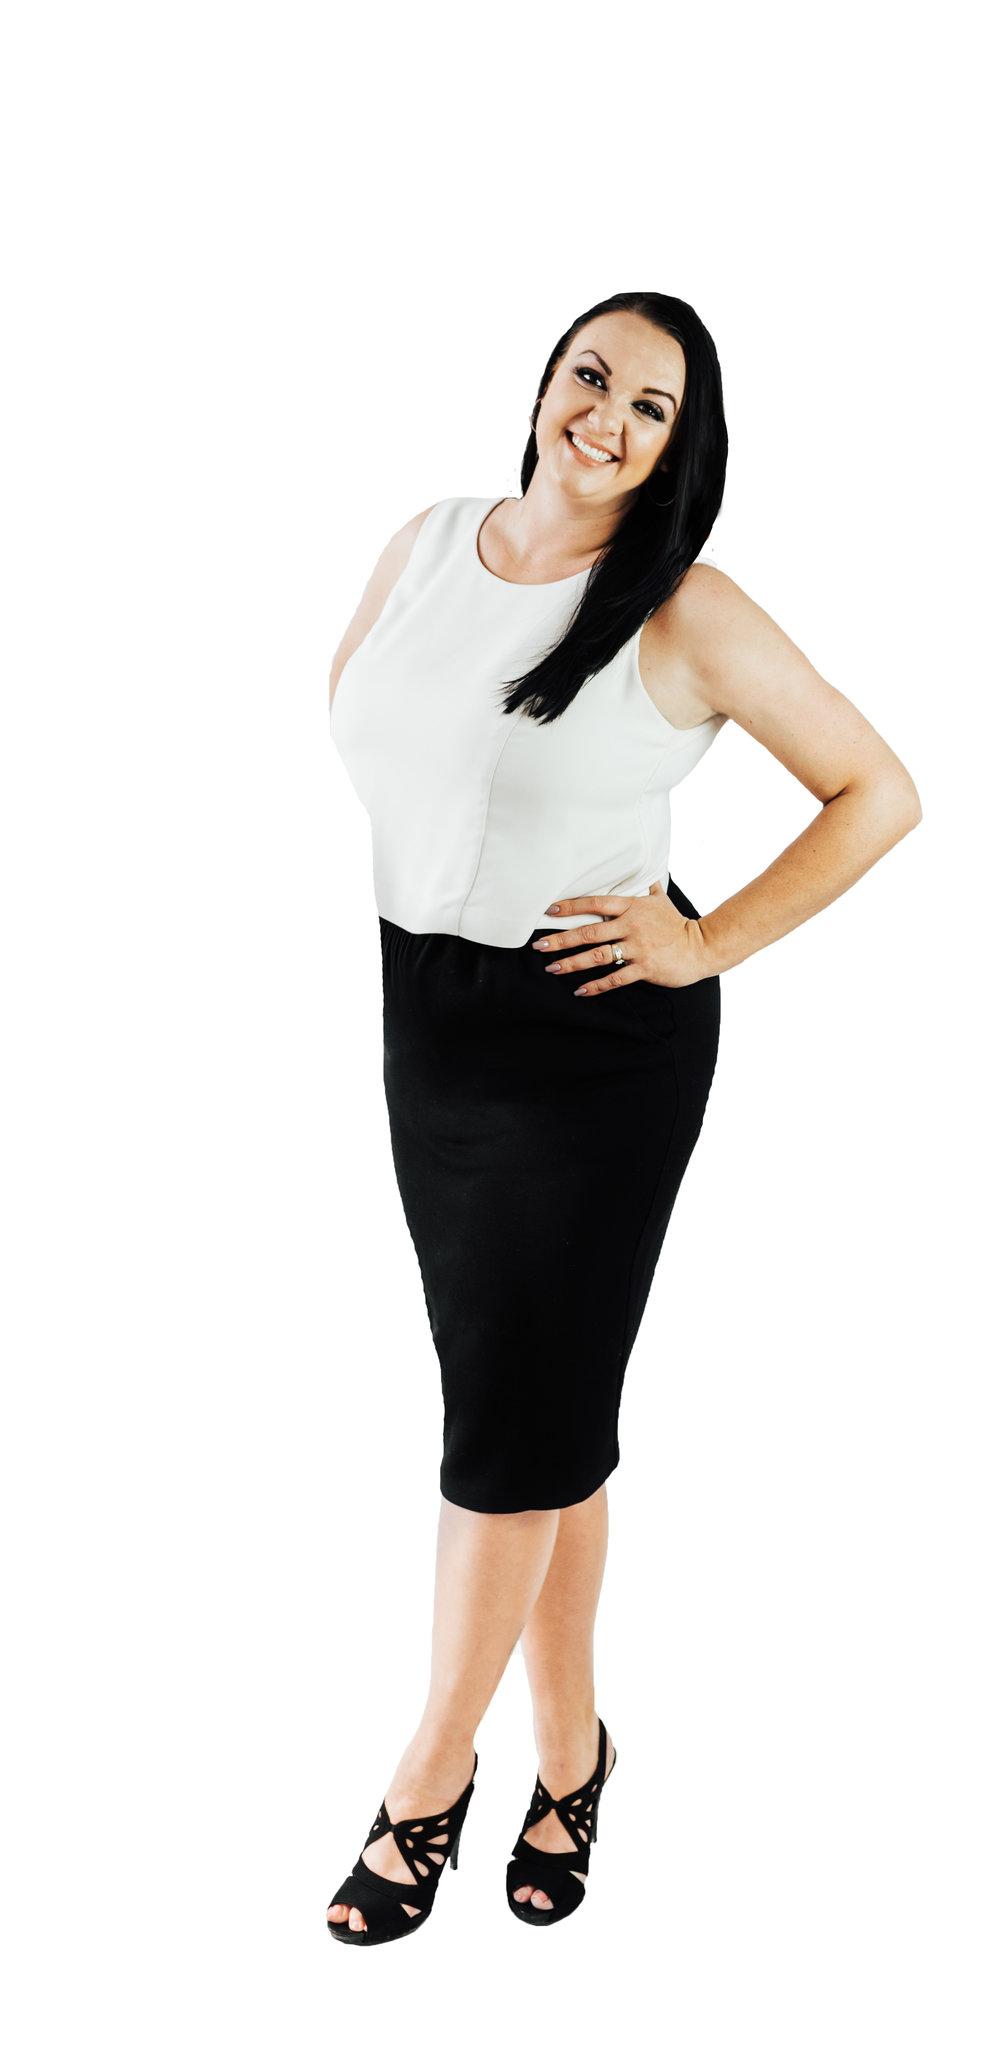 Kayli Waite